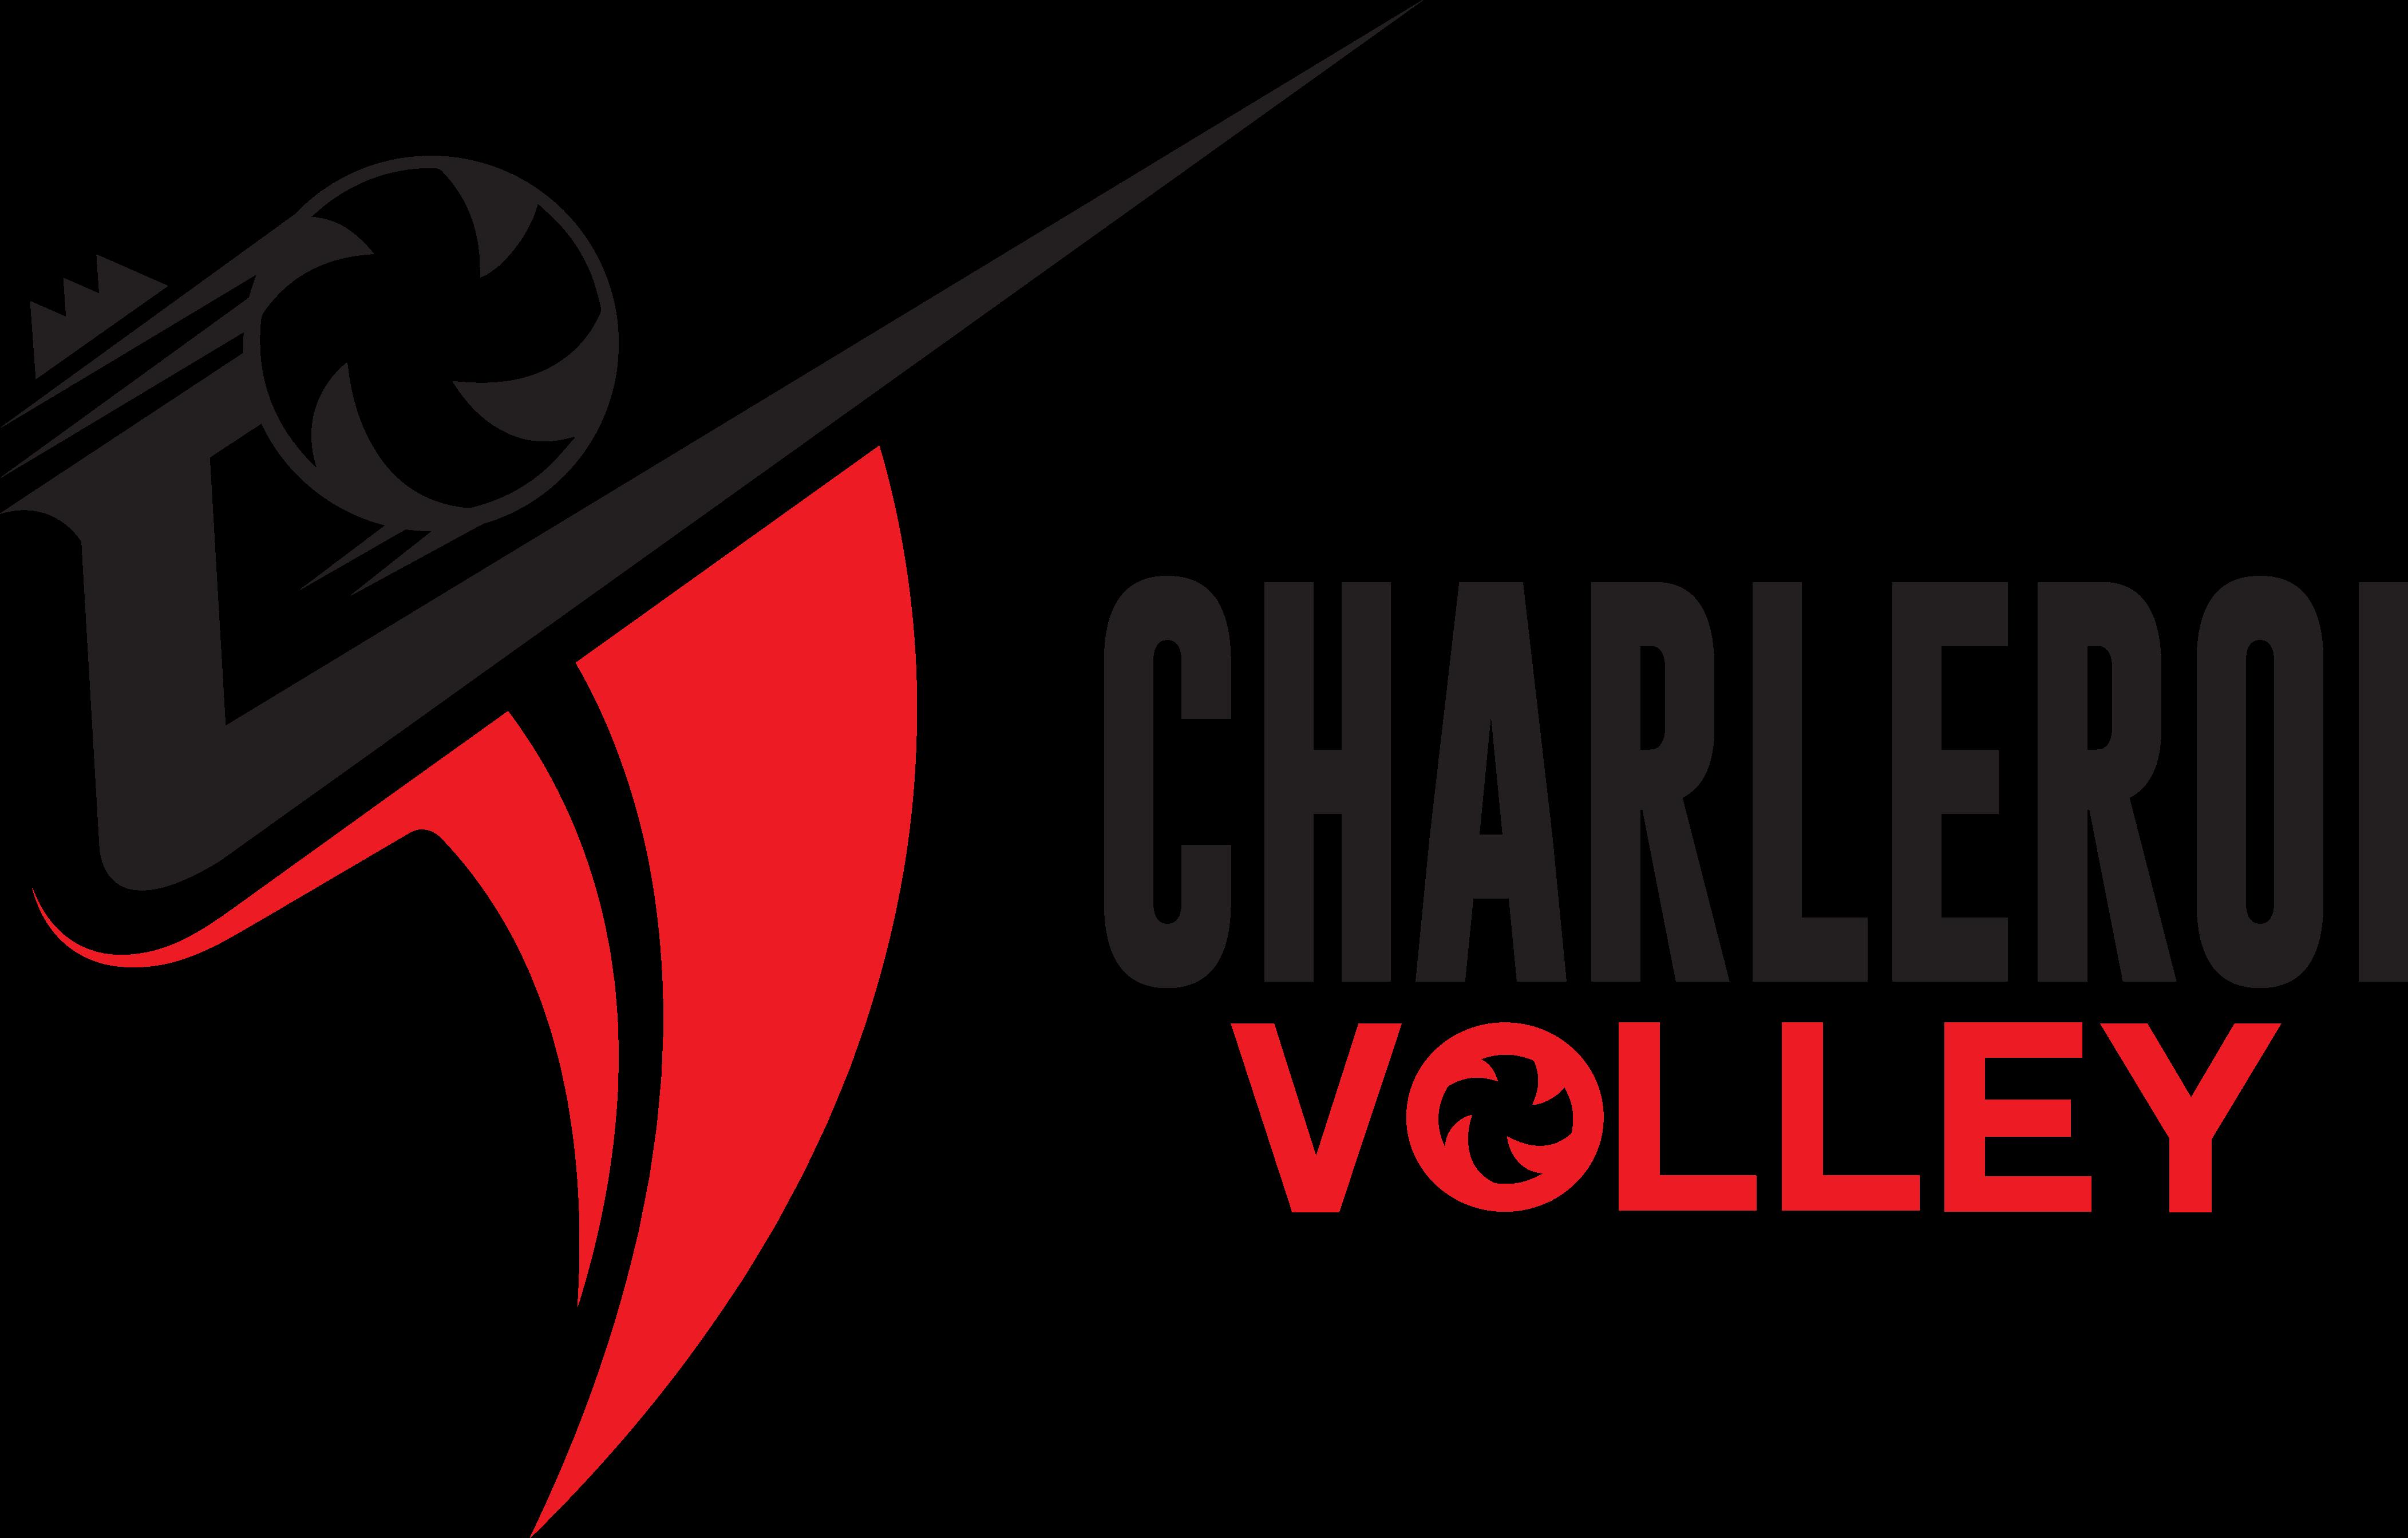 Charleroi Volley